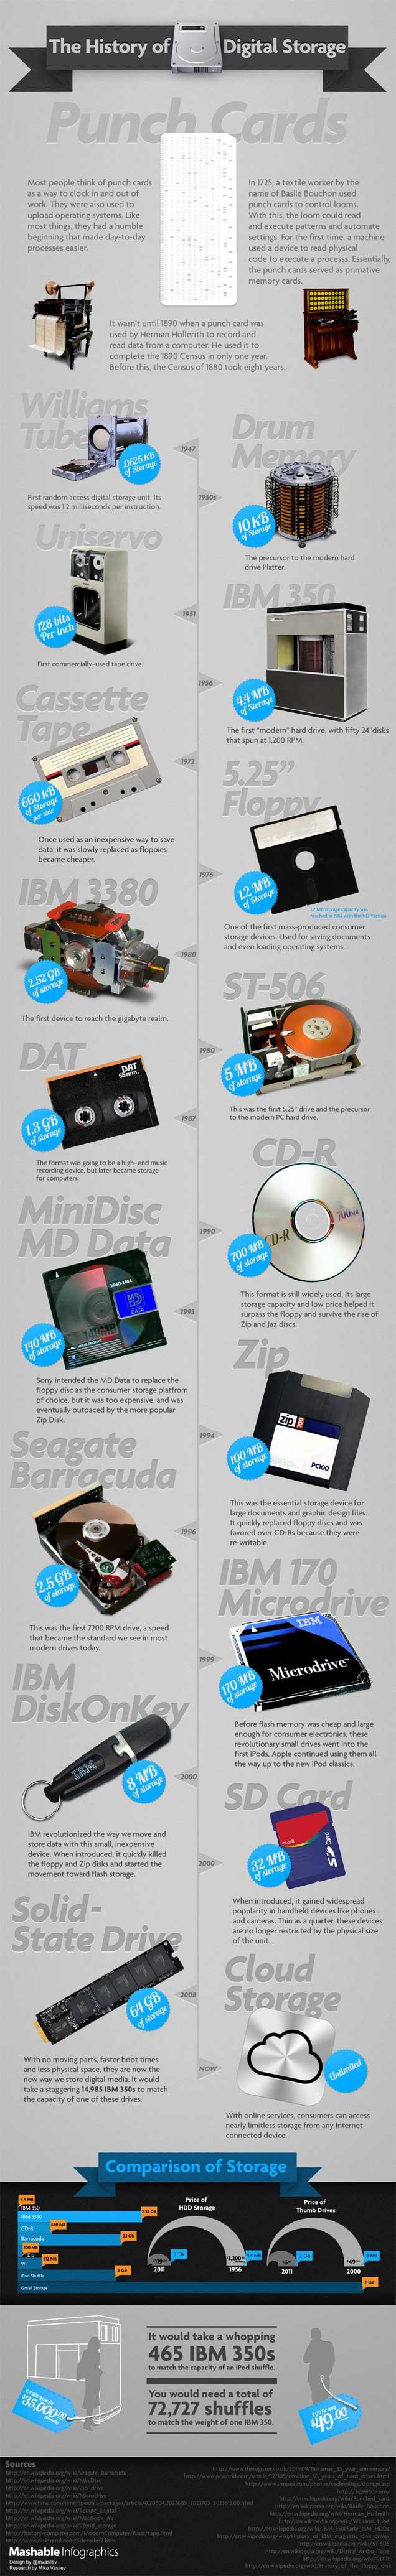 history of digital storage